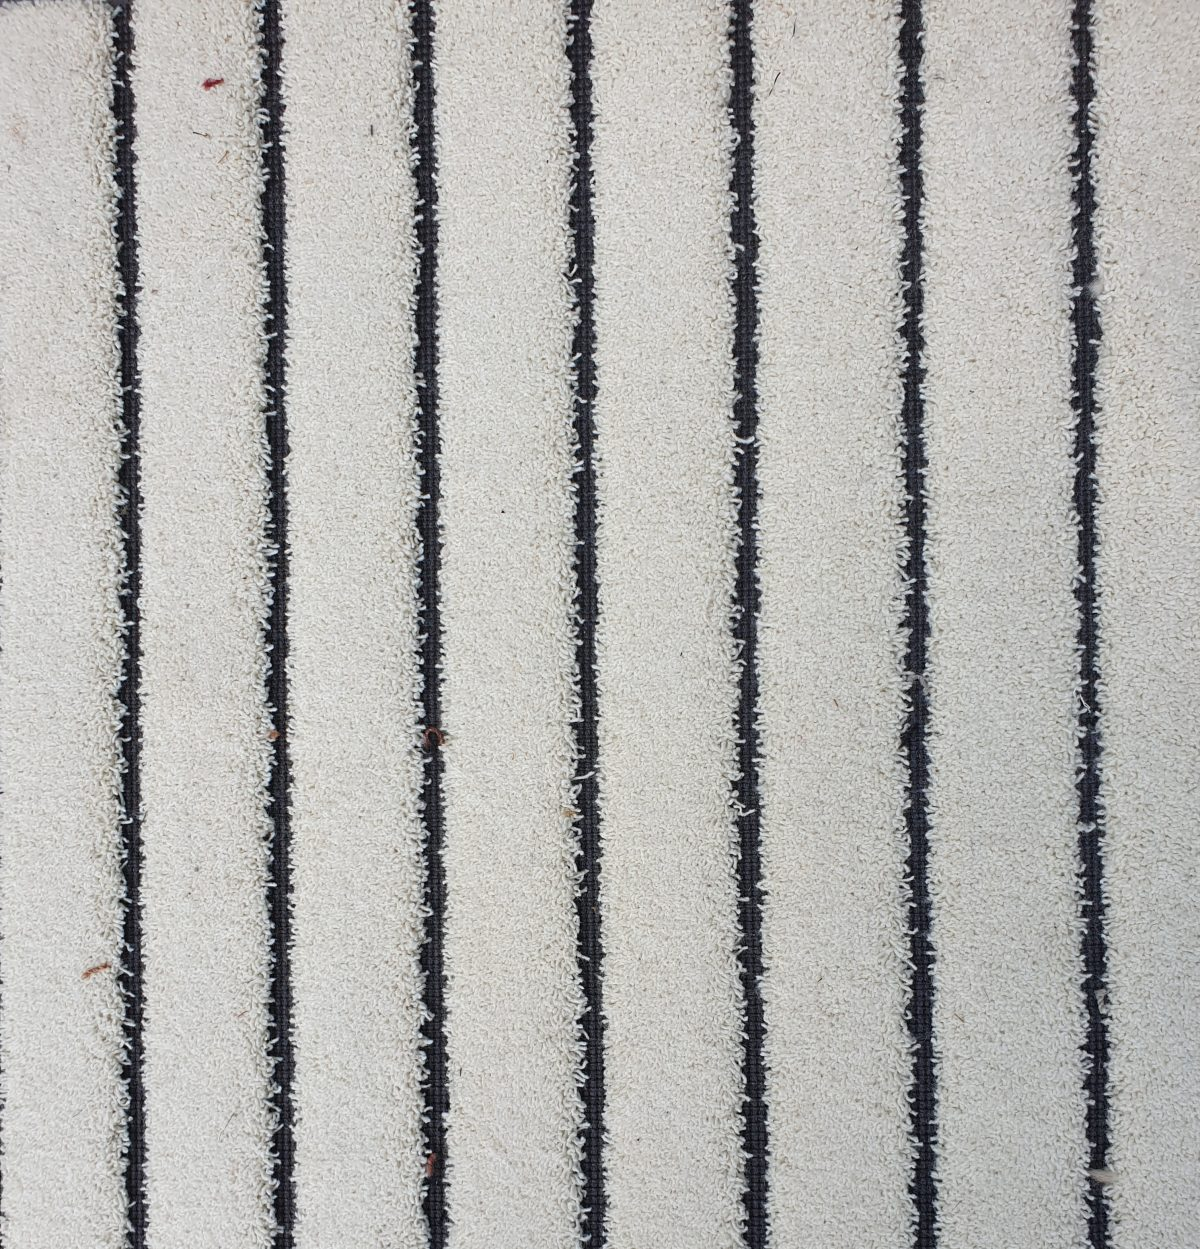 5501 off white 2 1200x1249 - Van Besouw type 5501